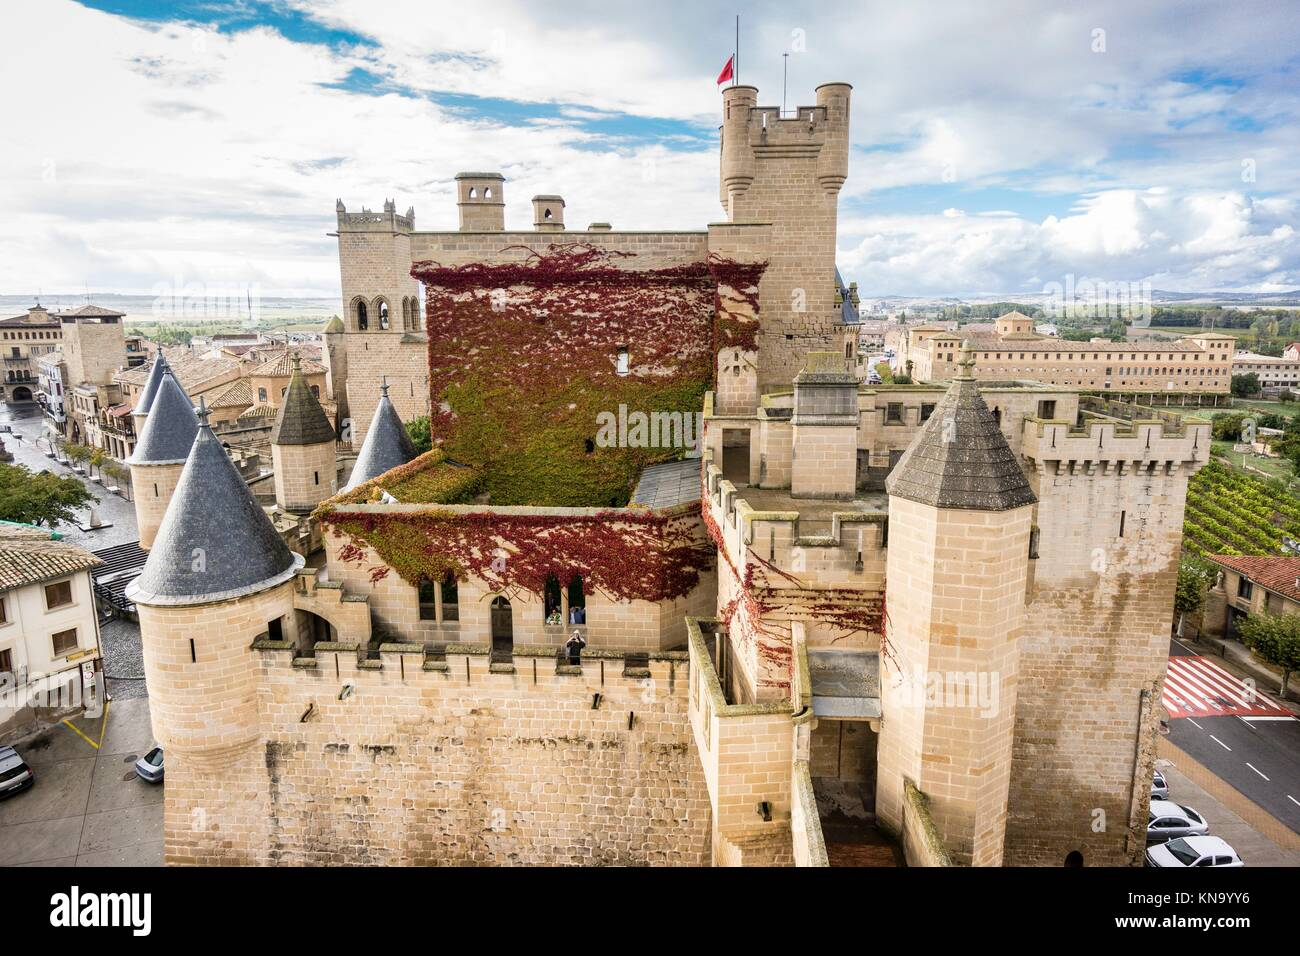 Palace of the Kings of Navarre castle, Olite, Navarra Community, Spain. Stock Photo